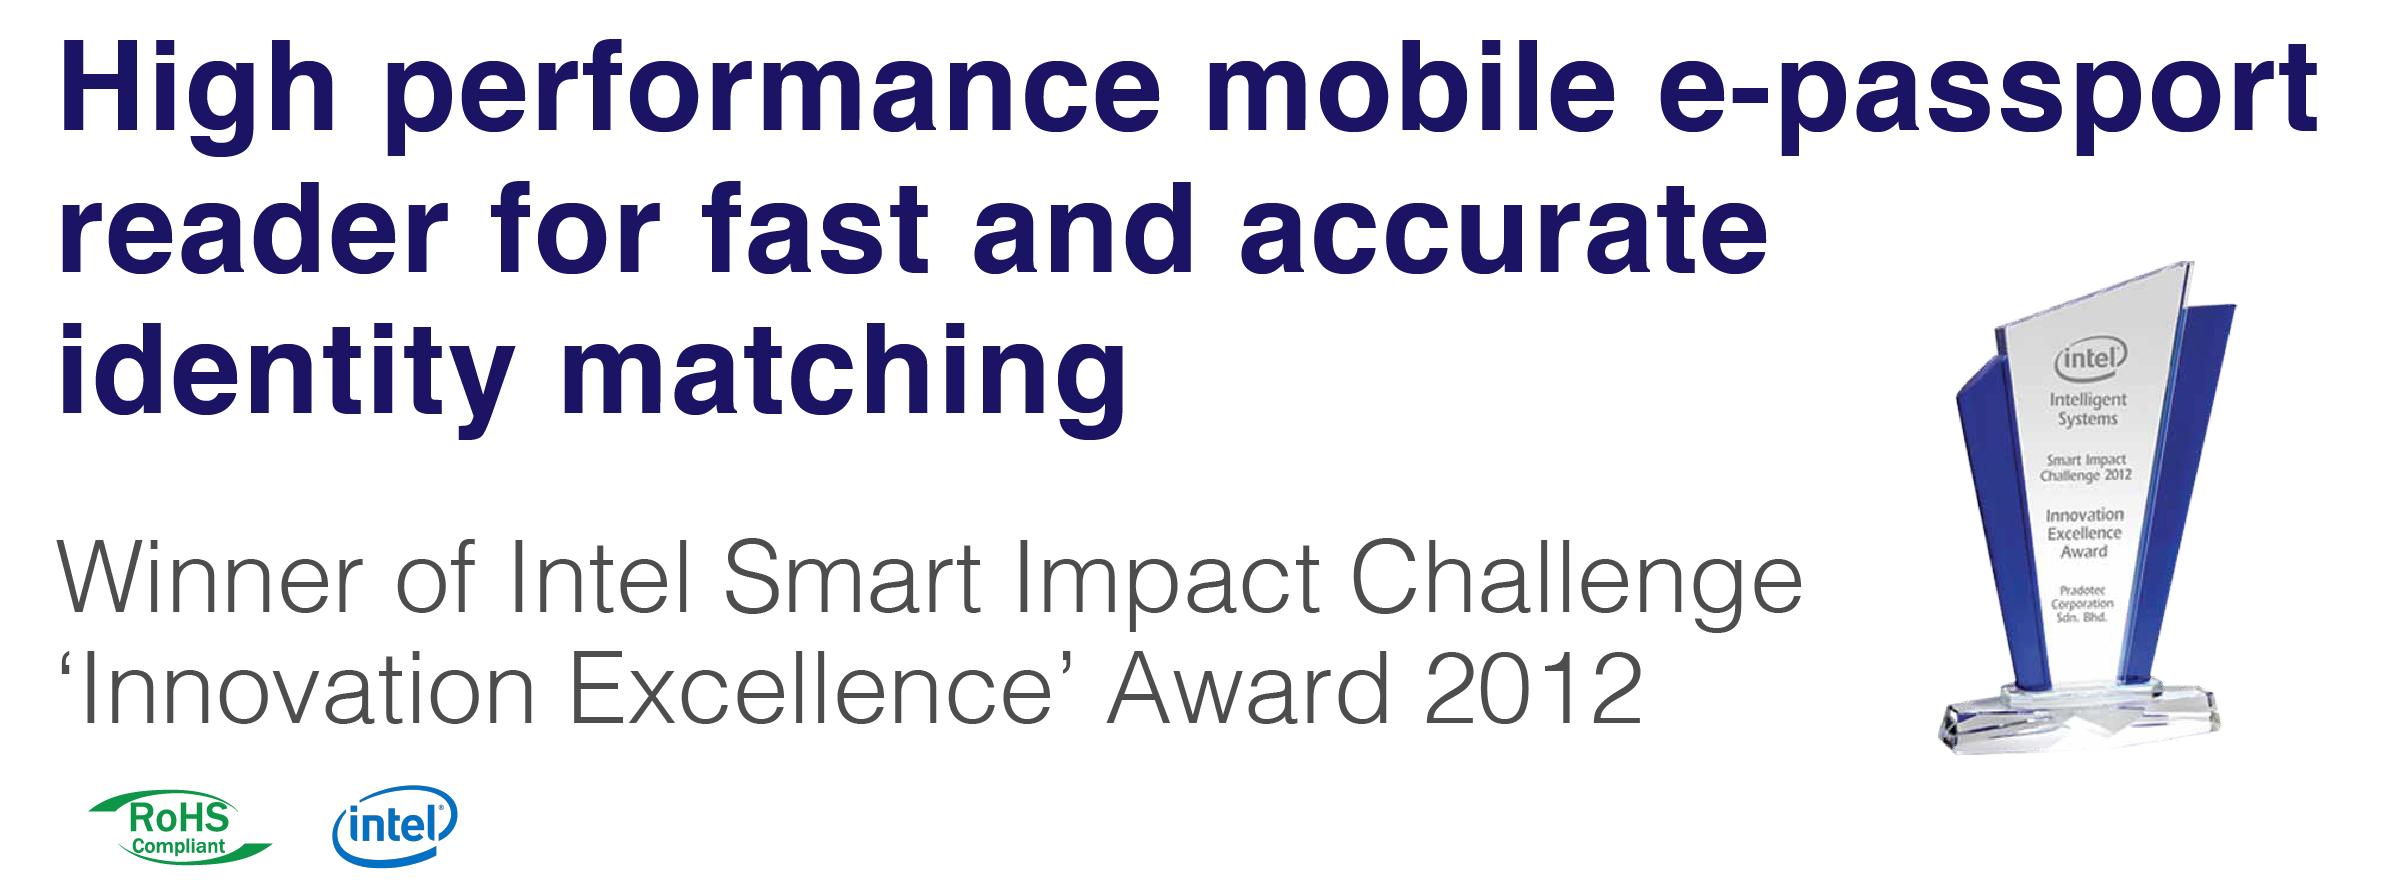 HPT 600 Product Page_Intel Award Description .png